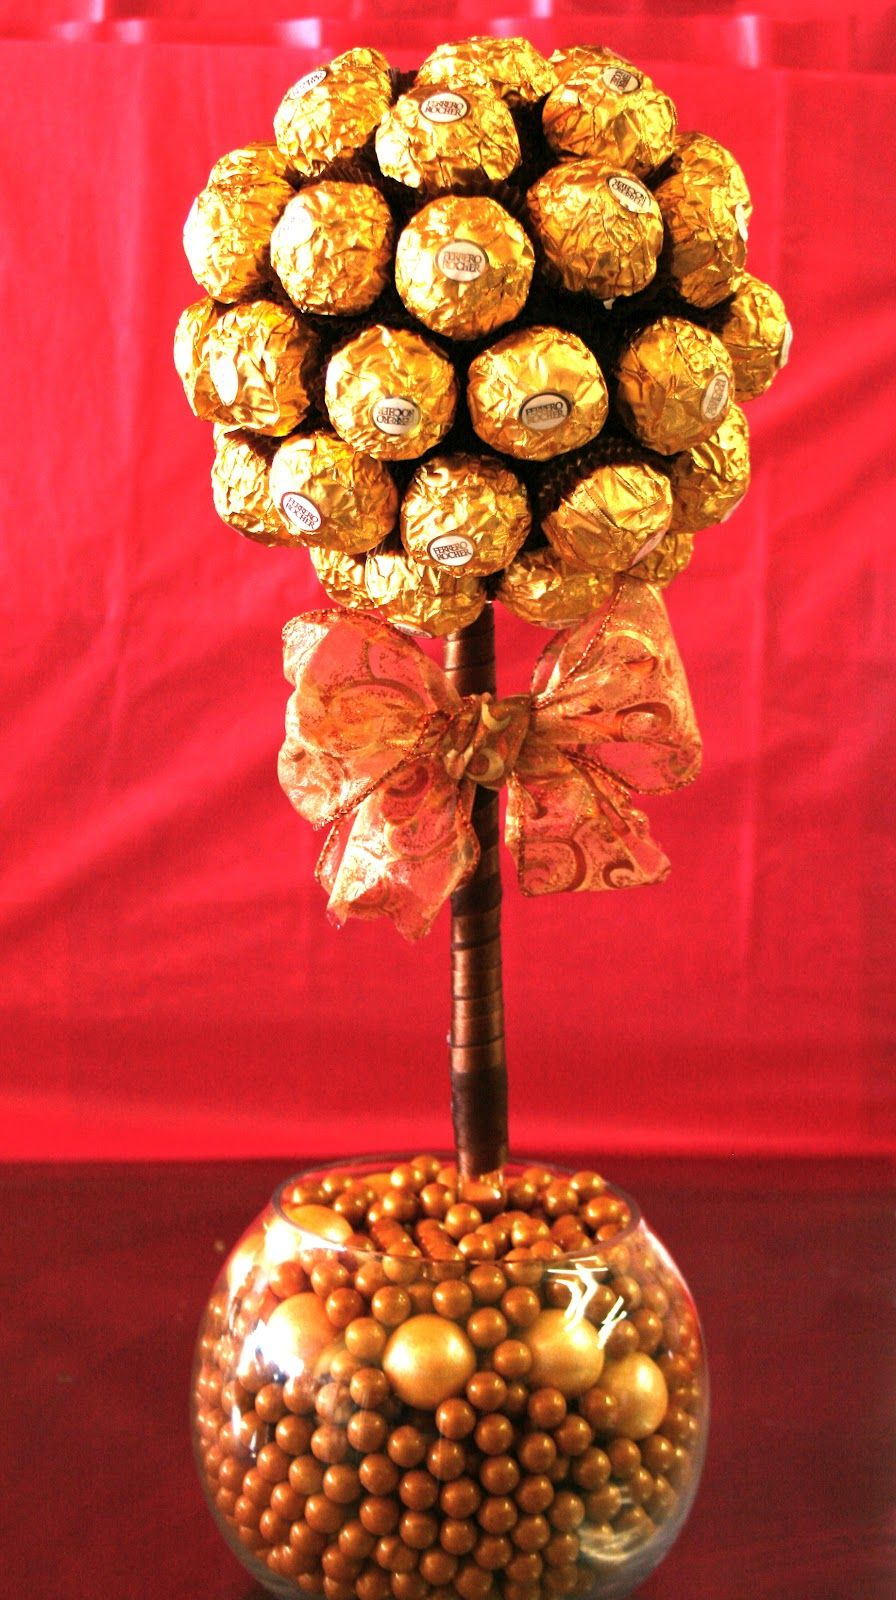 Chocolate Tree centerpiece | Chocolate Heaven | Pinterest | Candy ...